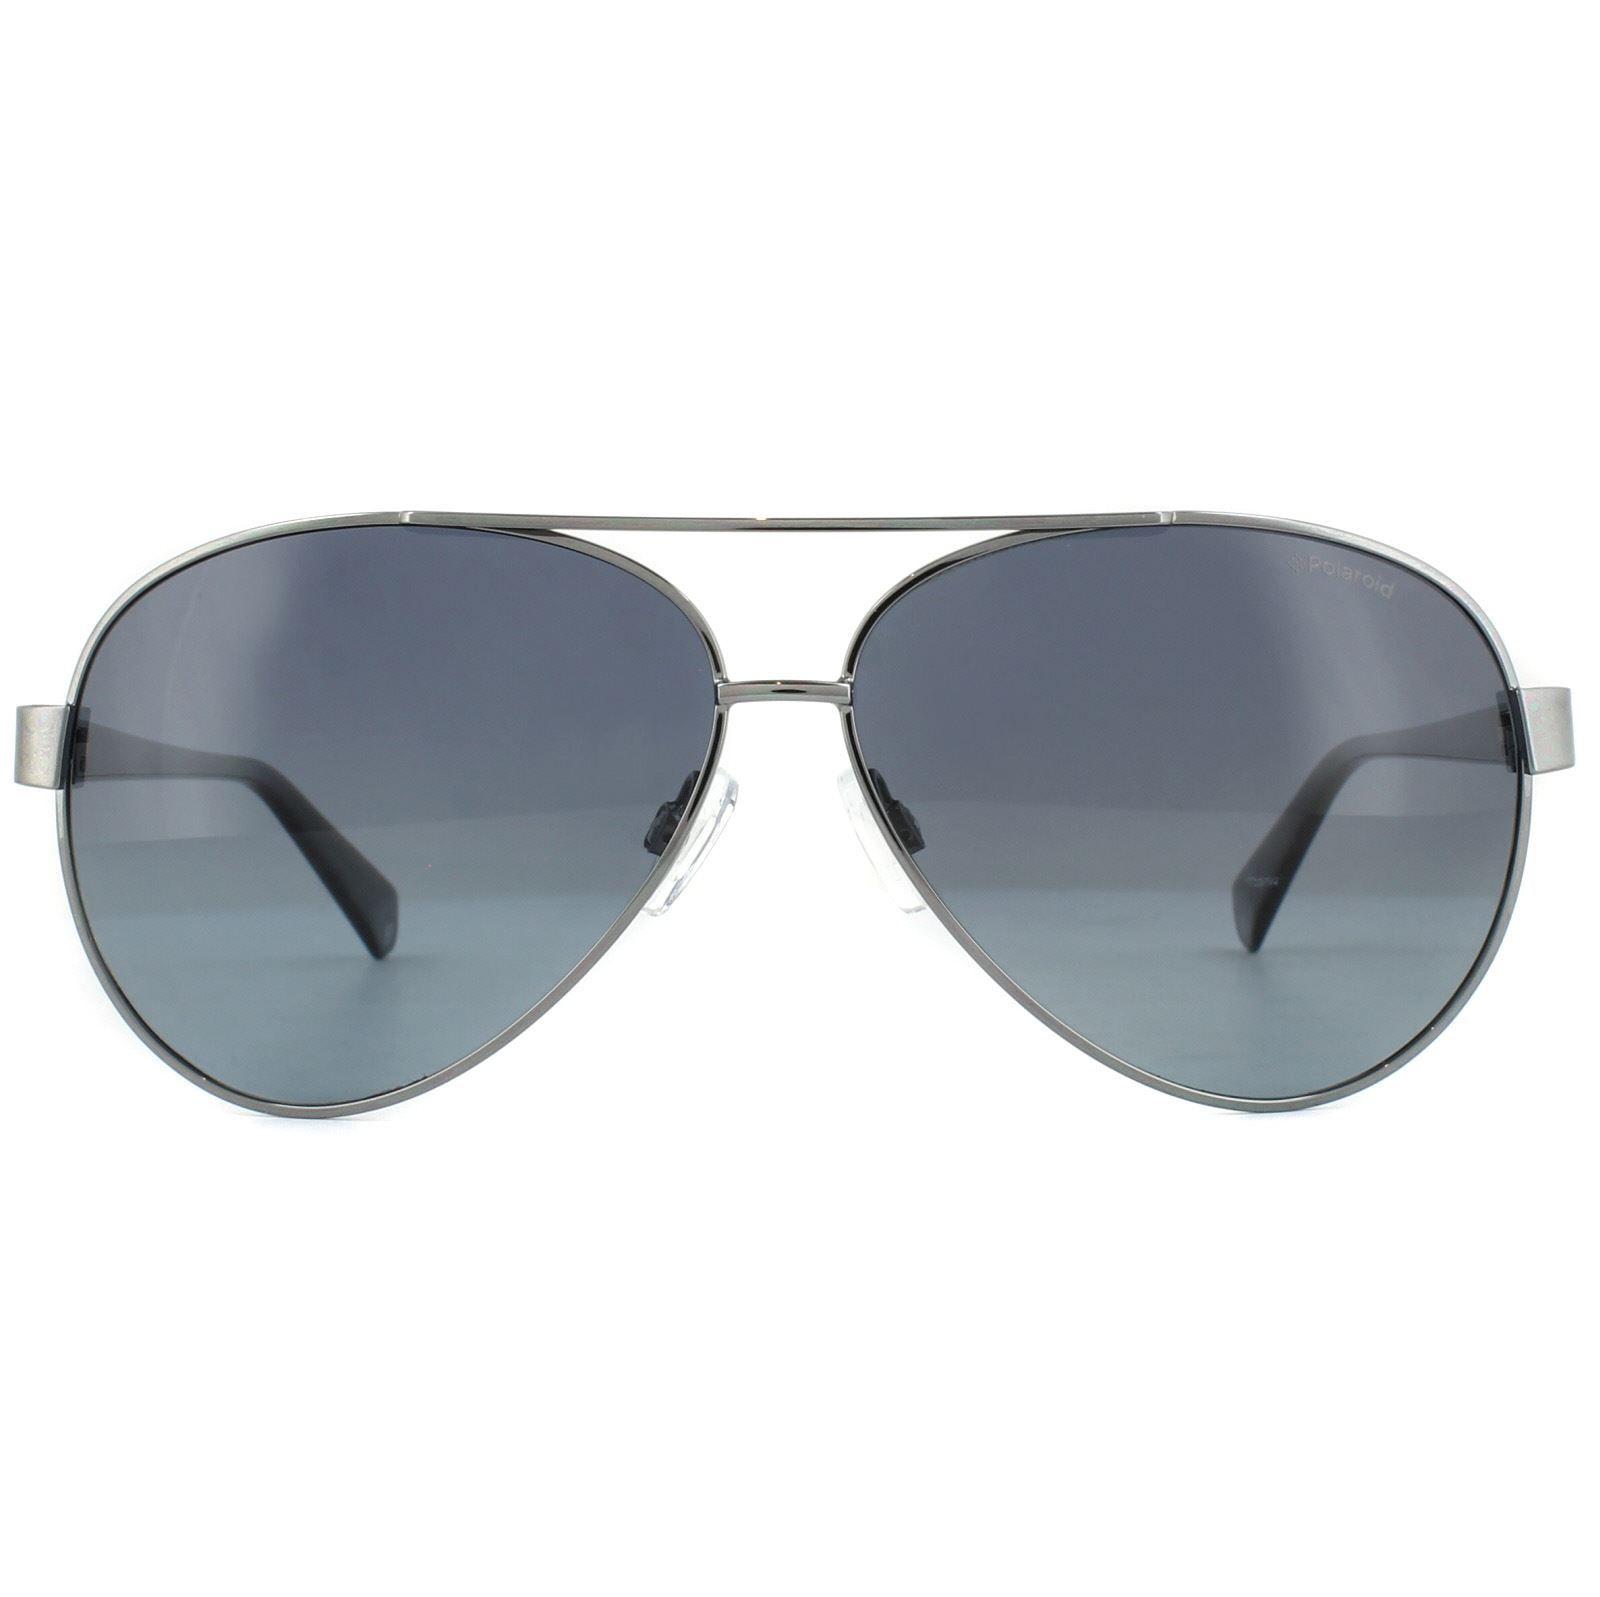 Polaroid Sunglasses PLD 4061/S 6LB WJ Aviator Ruthenium Grey Gradient Polarized